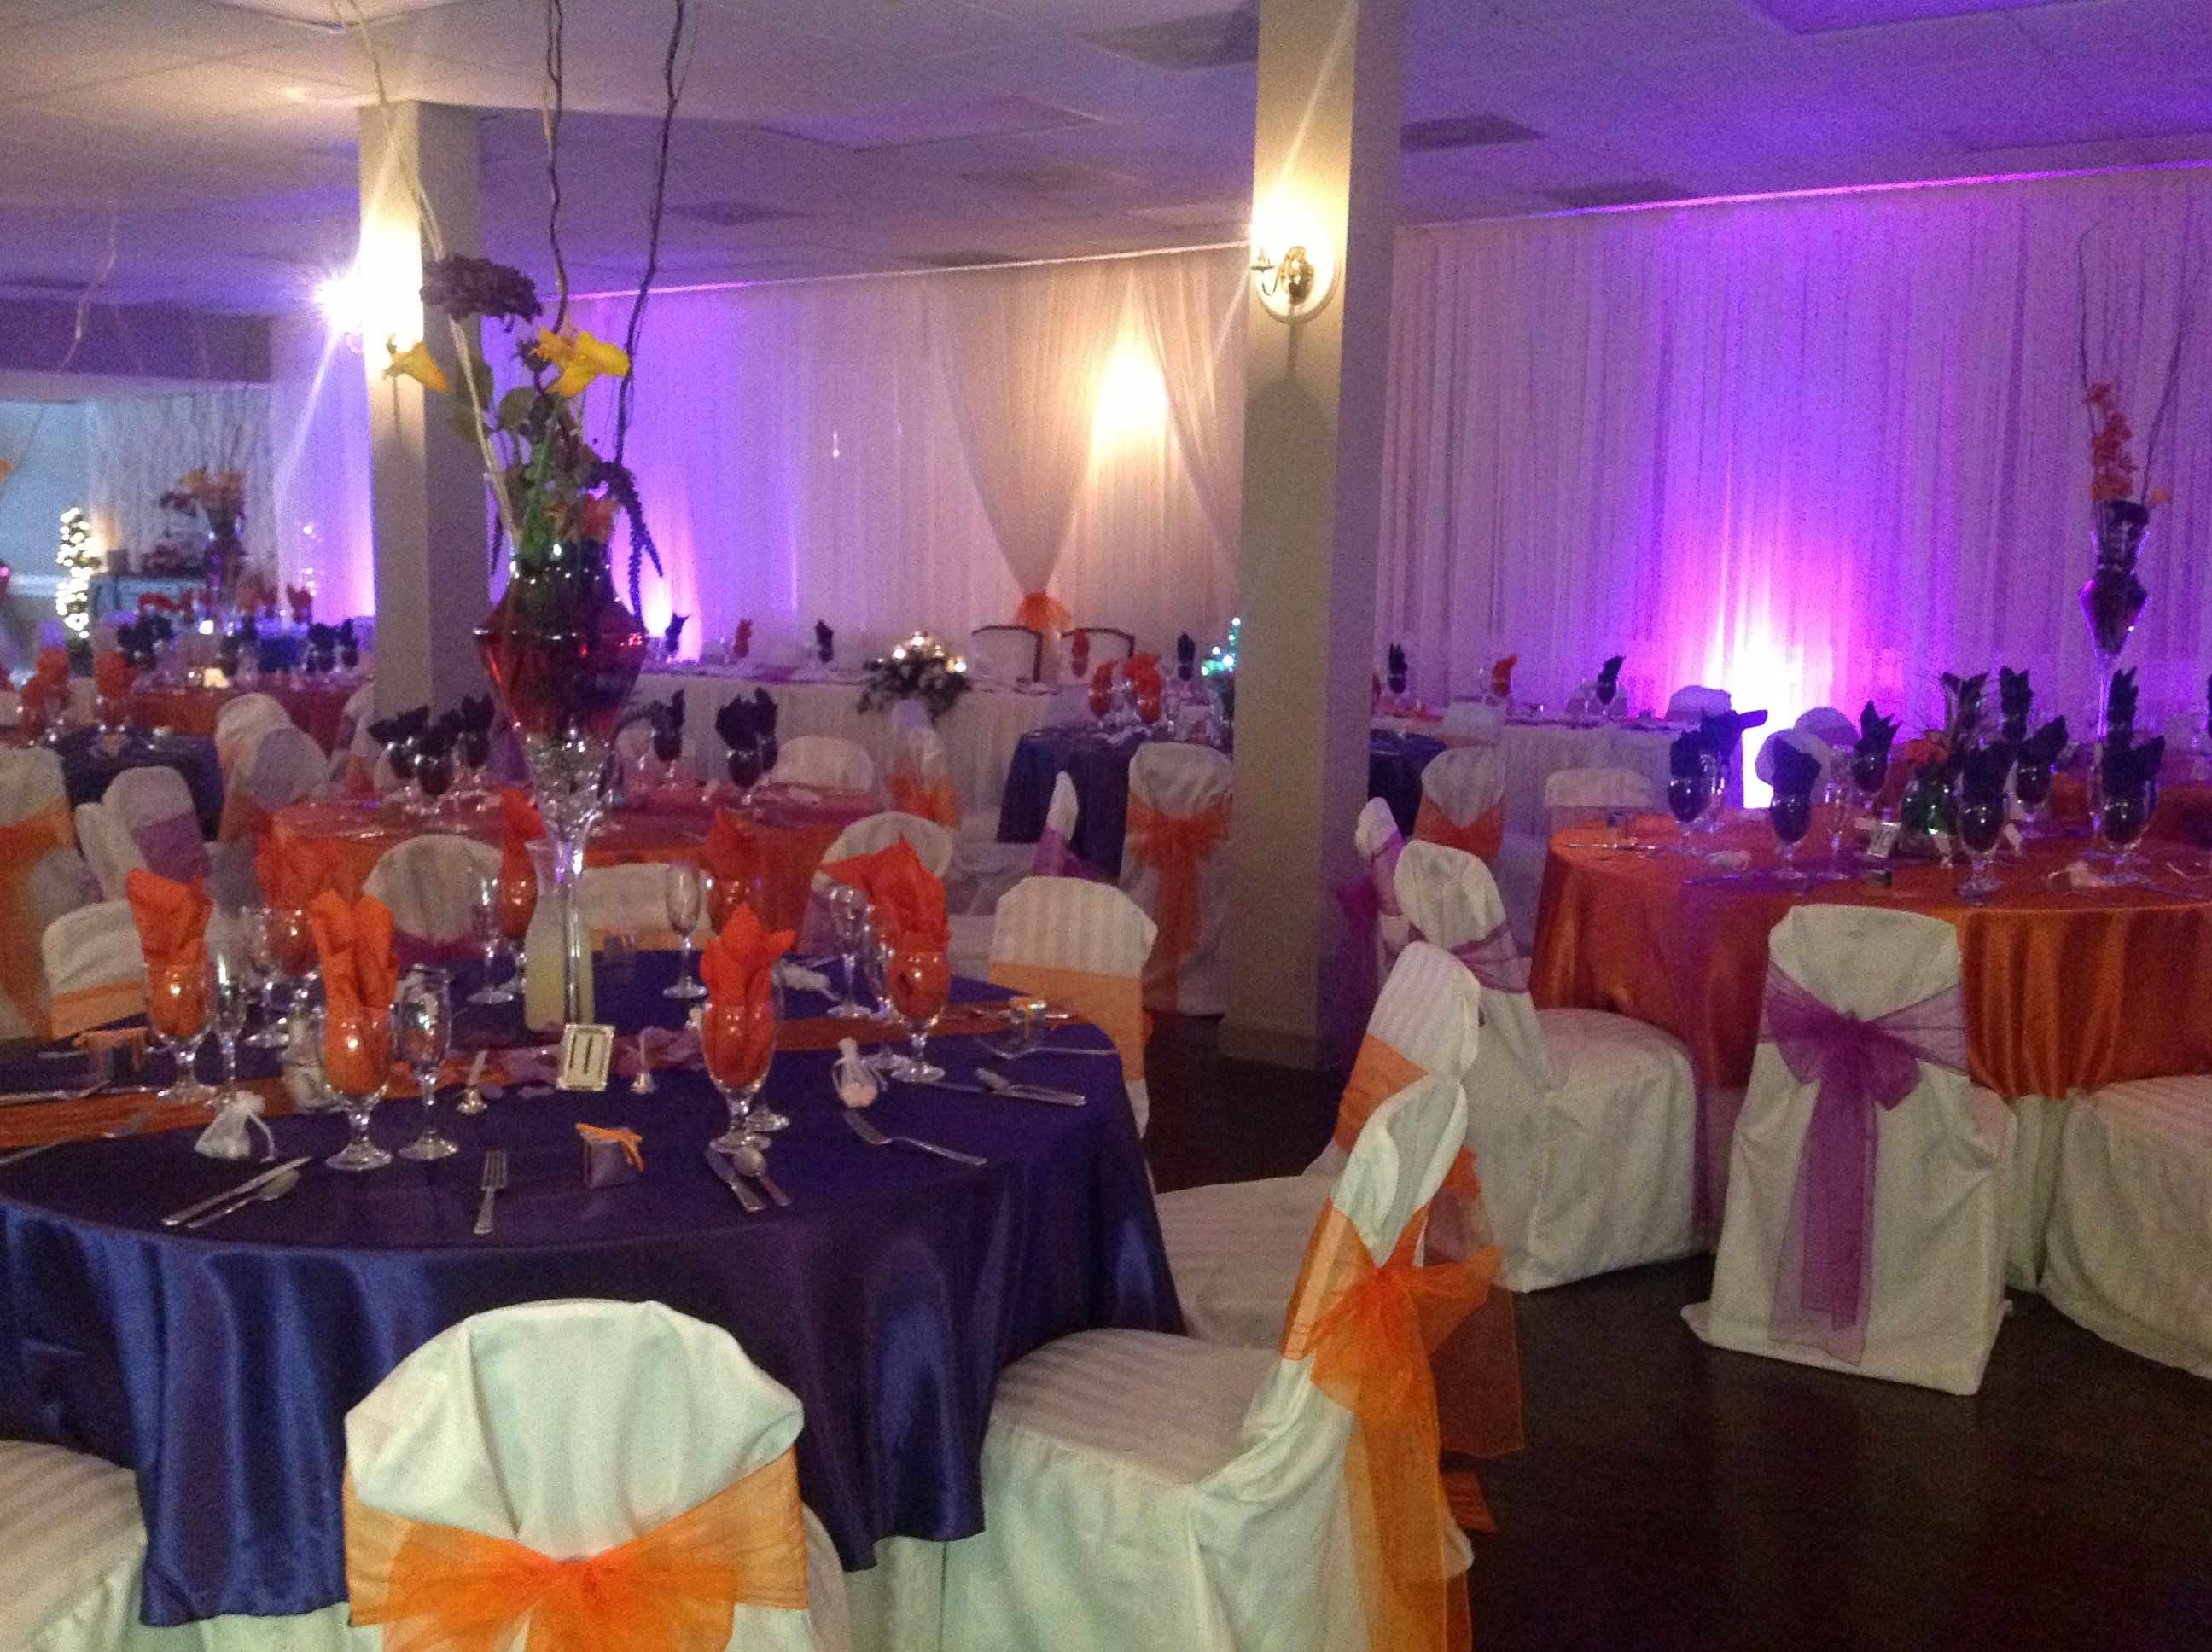 Royal Purple And Burnt Orange